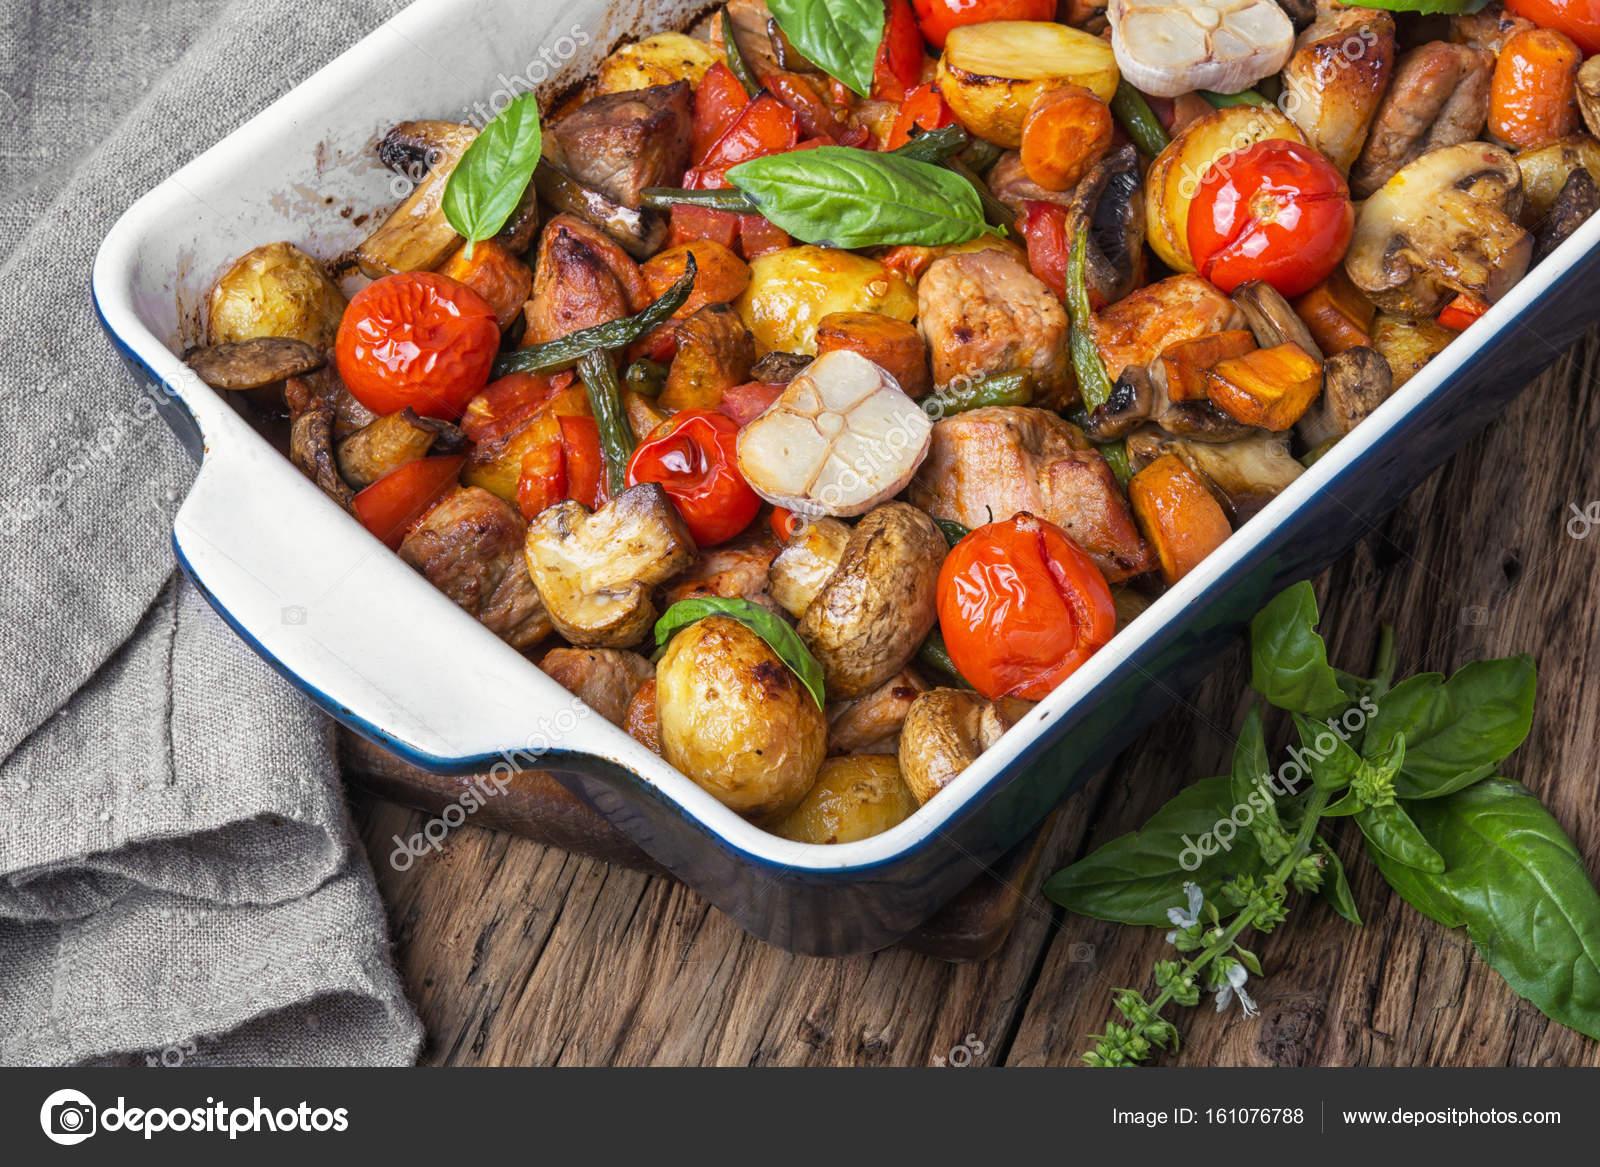 Мясо с овощами - пошаговый рецепт с фото на Повар.ру